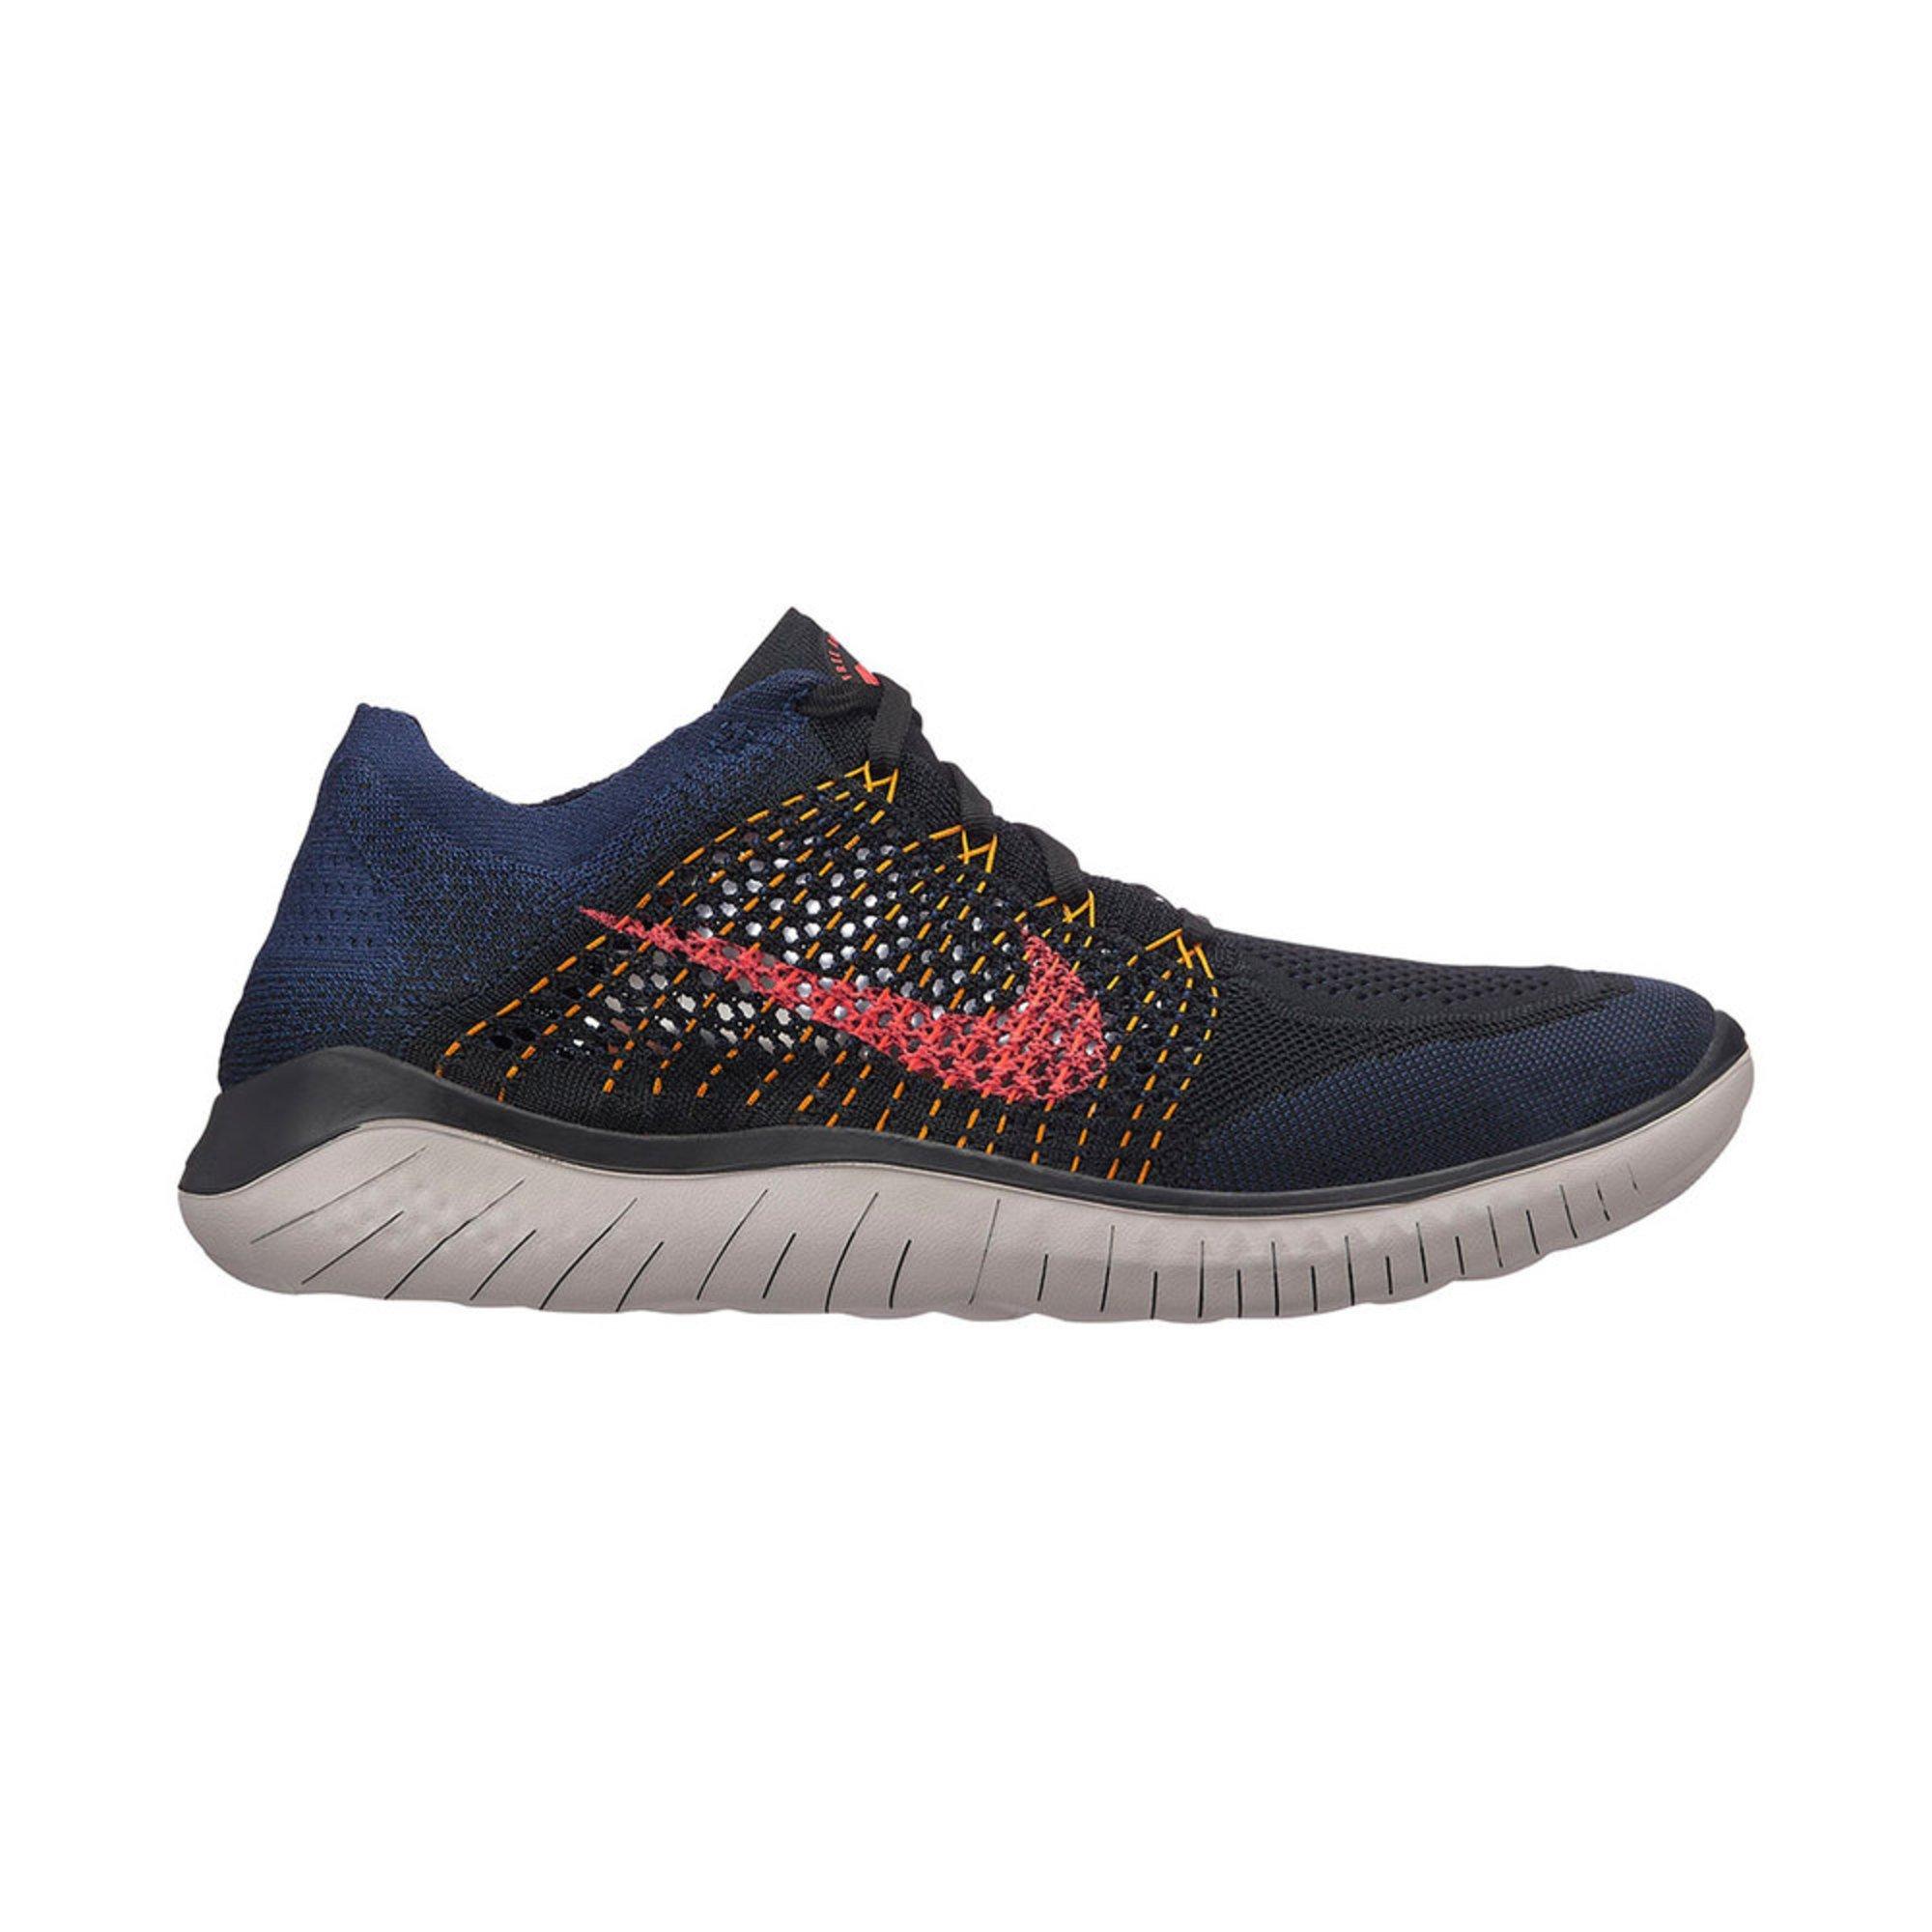 premium selection 883c4 5d6f5 Nike. Nike Mens Free RN Flyknit 2018 Running Shoe